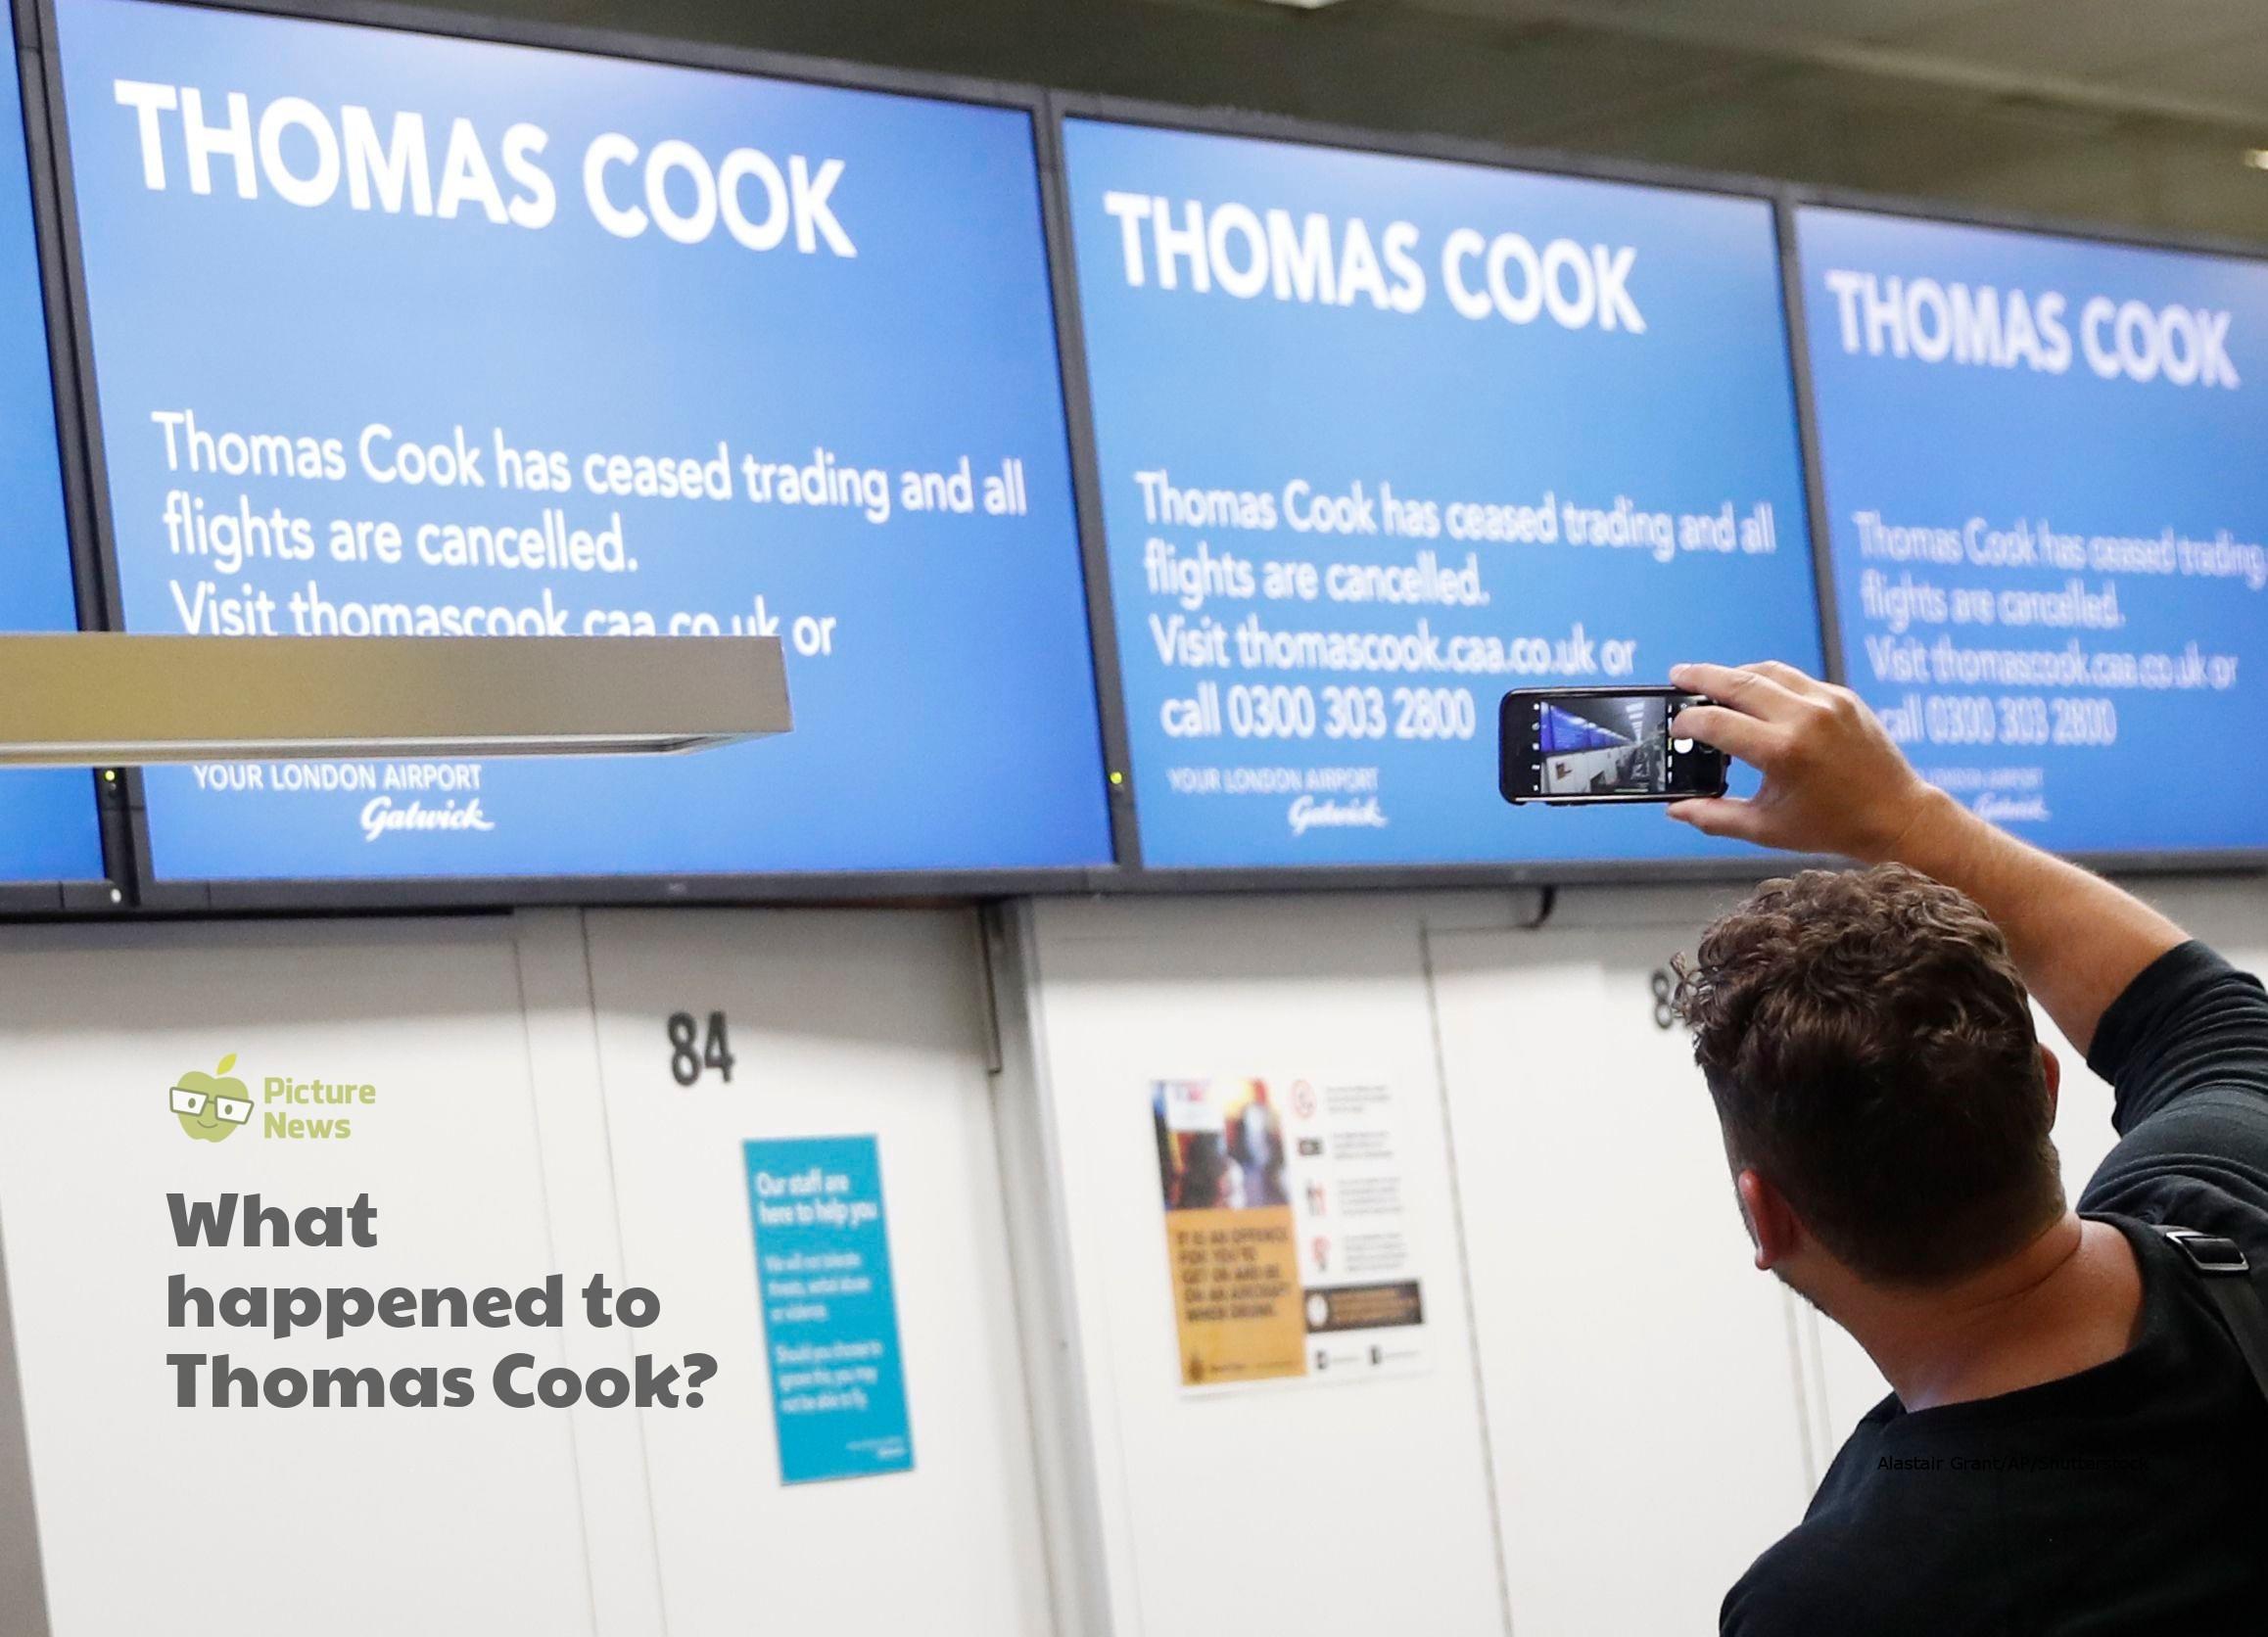 Thomas Cook Special News